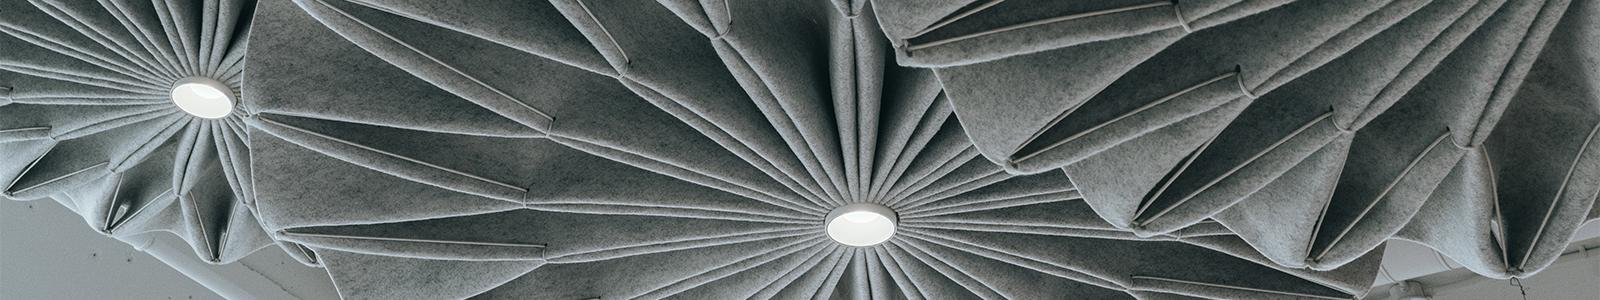 Closeup of three, gray, felt pinwheel lamps in the Dorothy O'Brien Innovation Lab.